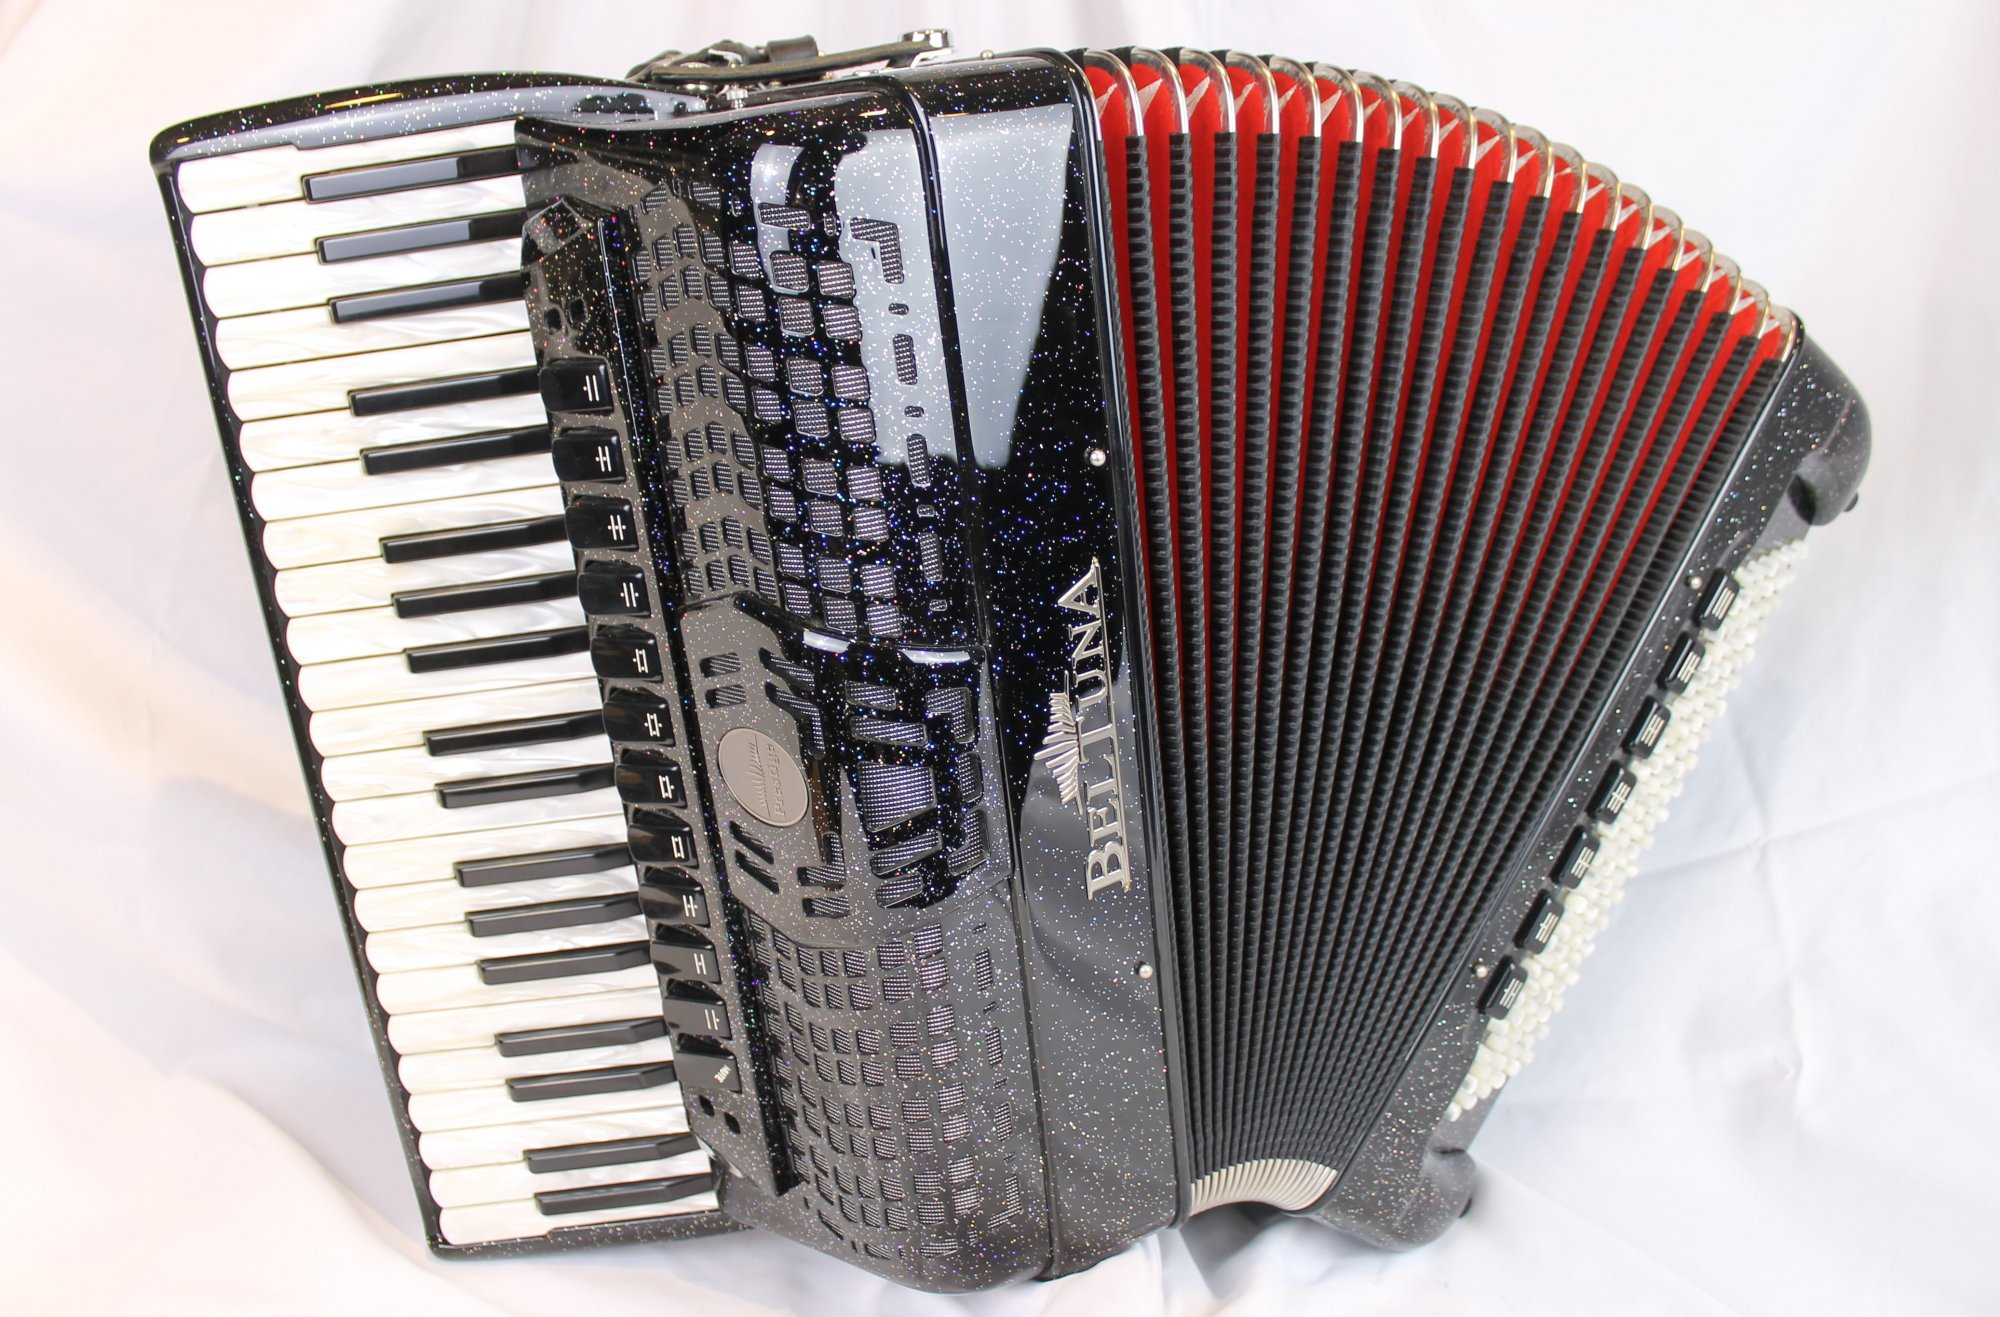 NEW Black Sparkle Beltuna Prestige IV Piano Accordion LMMH 41 120